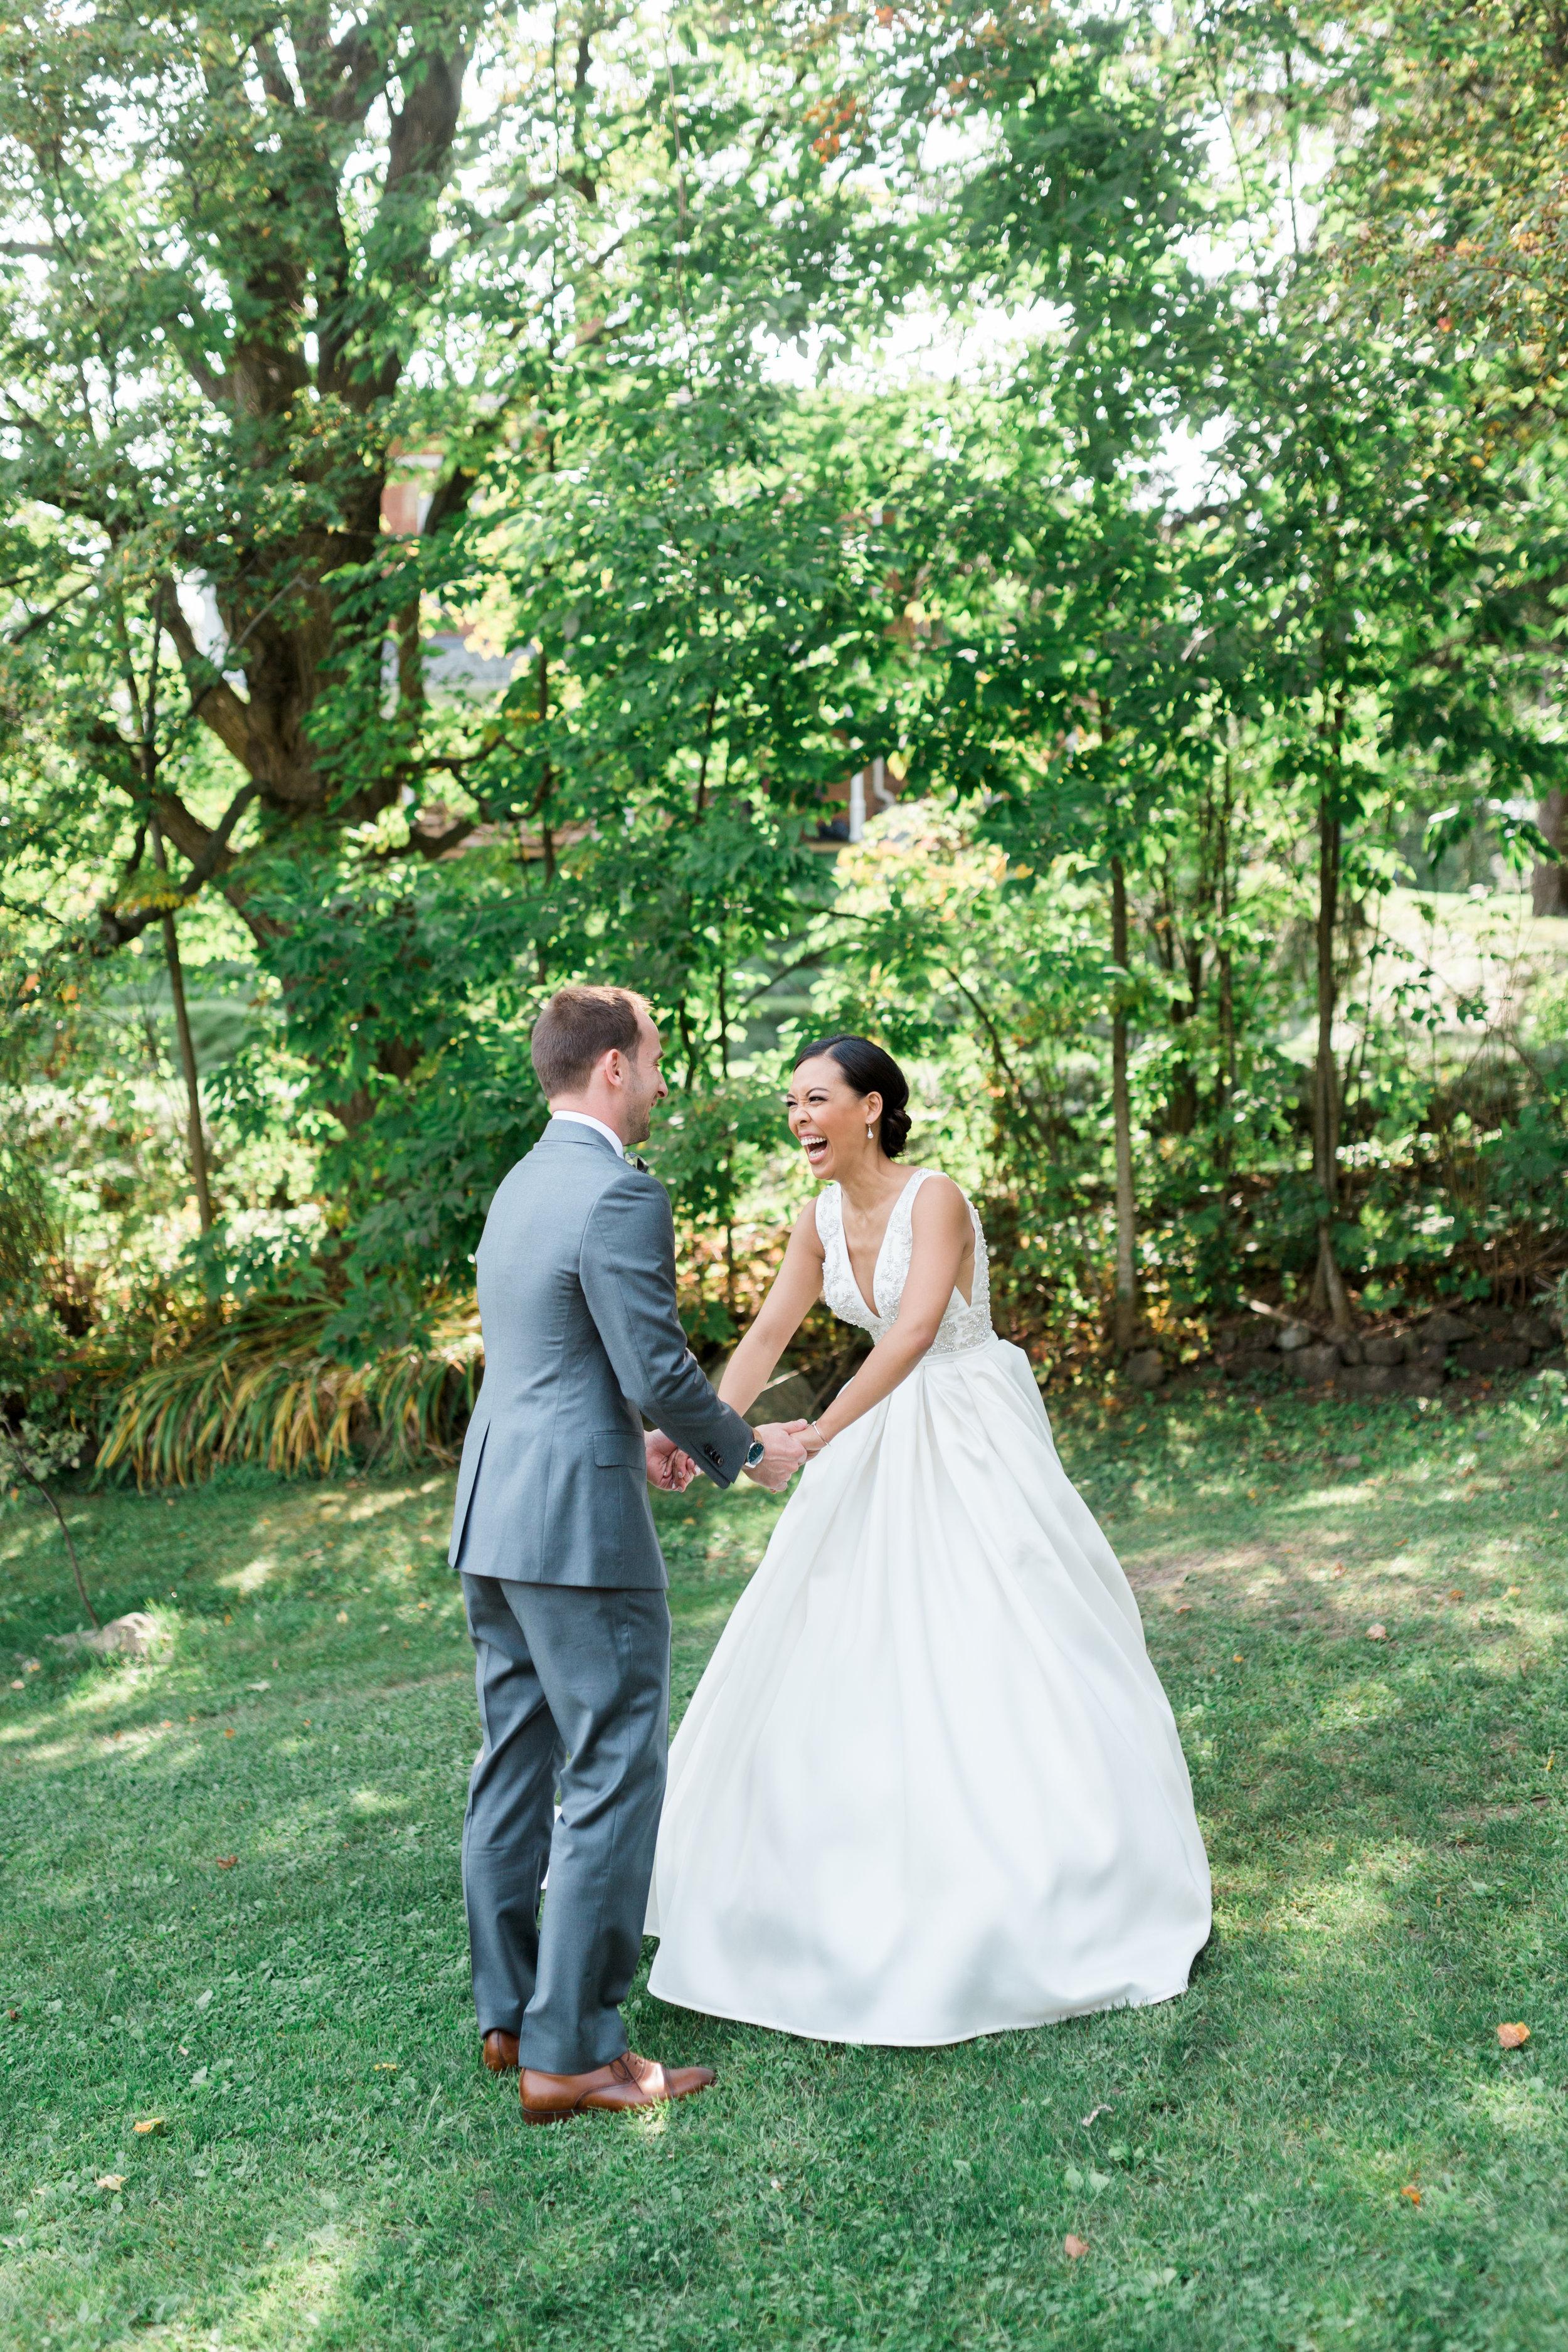 Alton Mills Wedding - First Look-11.jpg